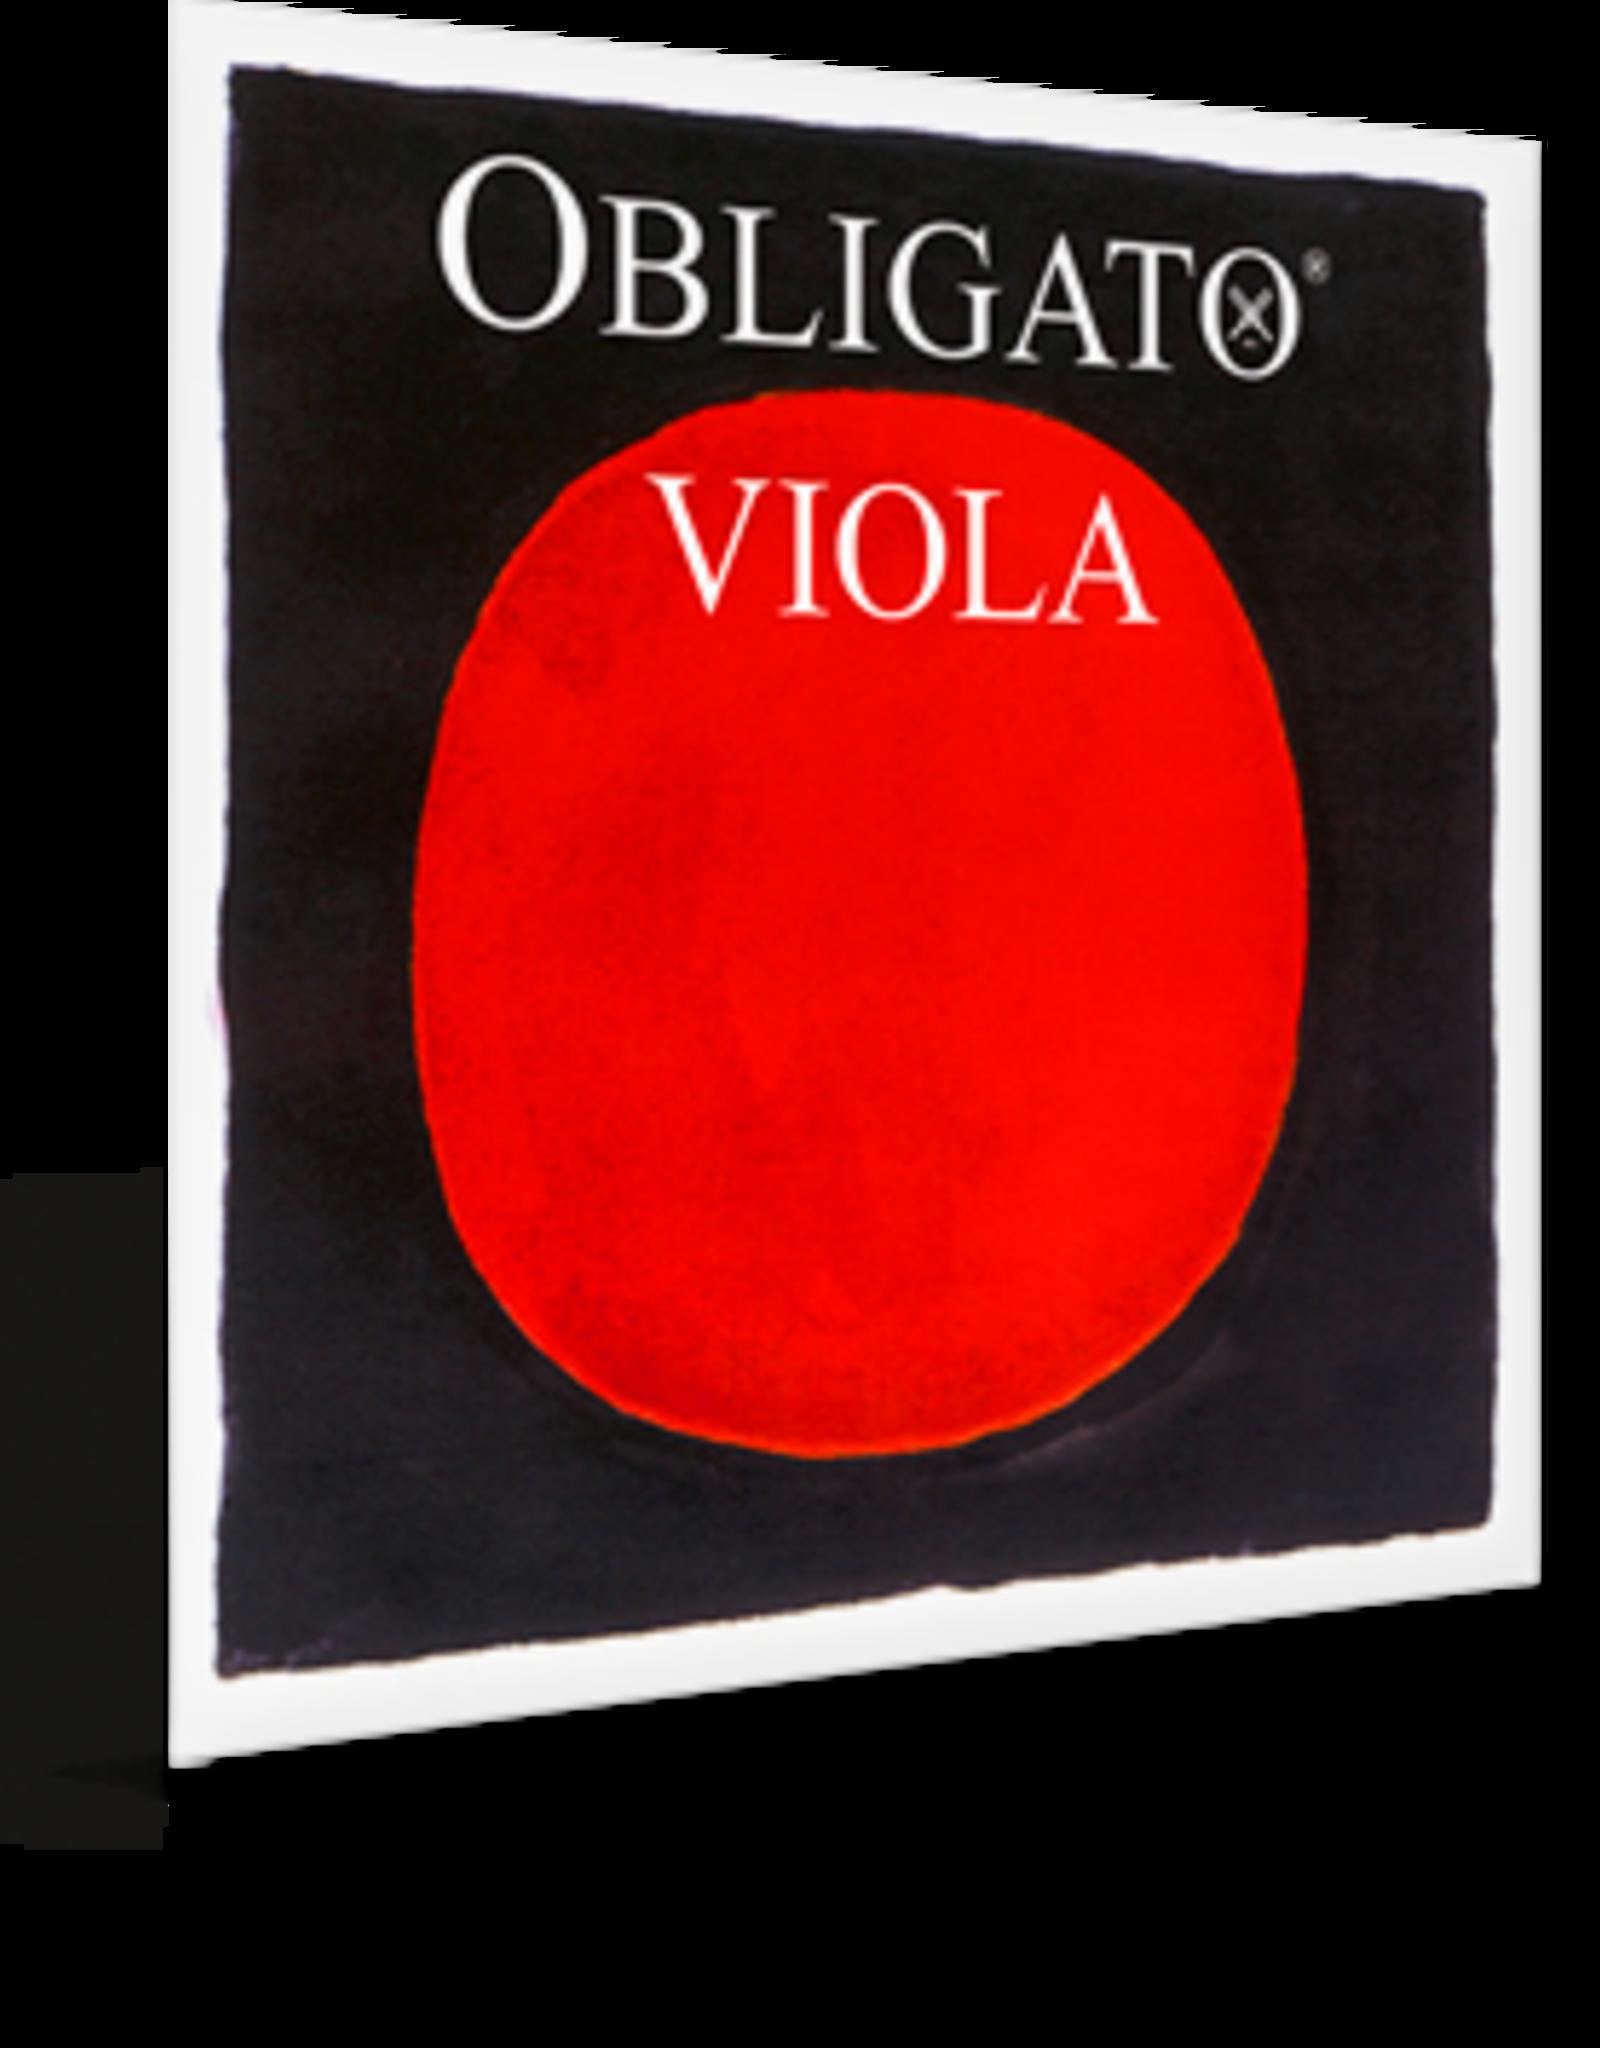 PIRASTRO Viola Obligato D Synthetic/Silver Mittel Envelope